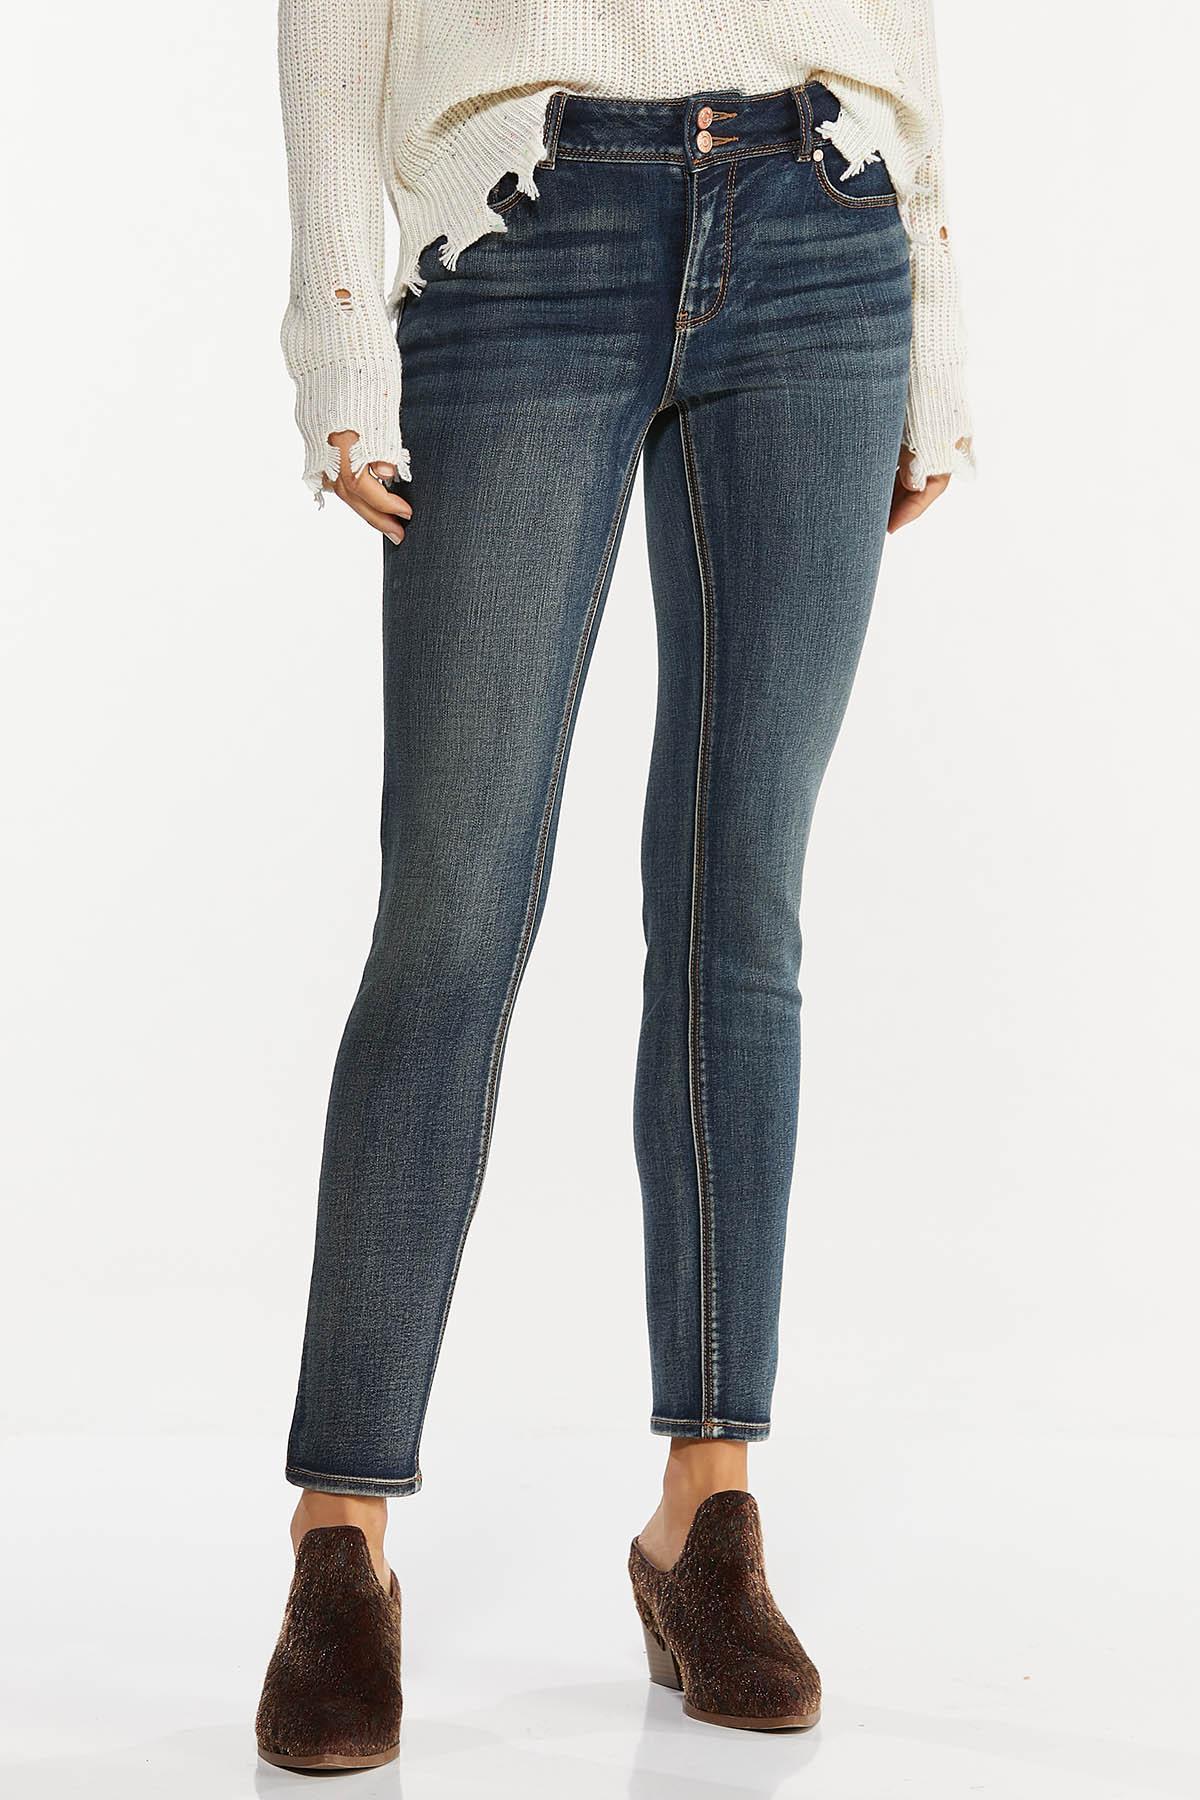 Skinny Shape Enhancing Jeans